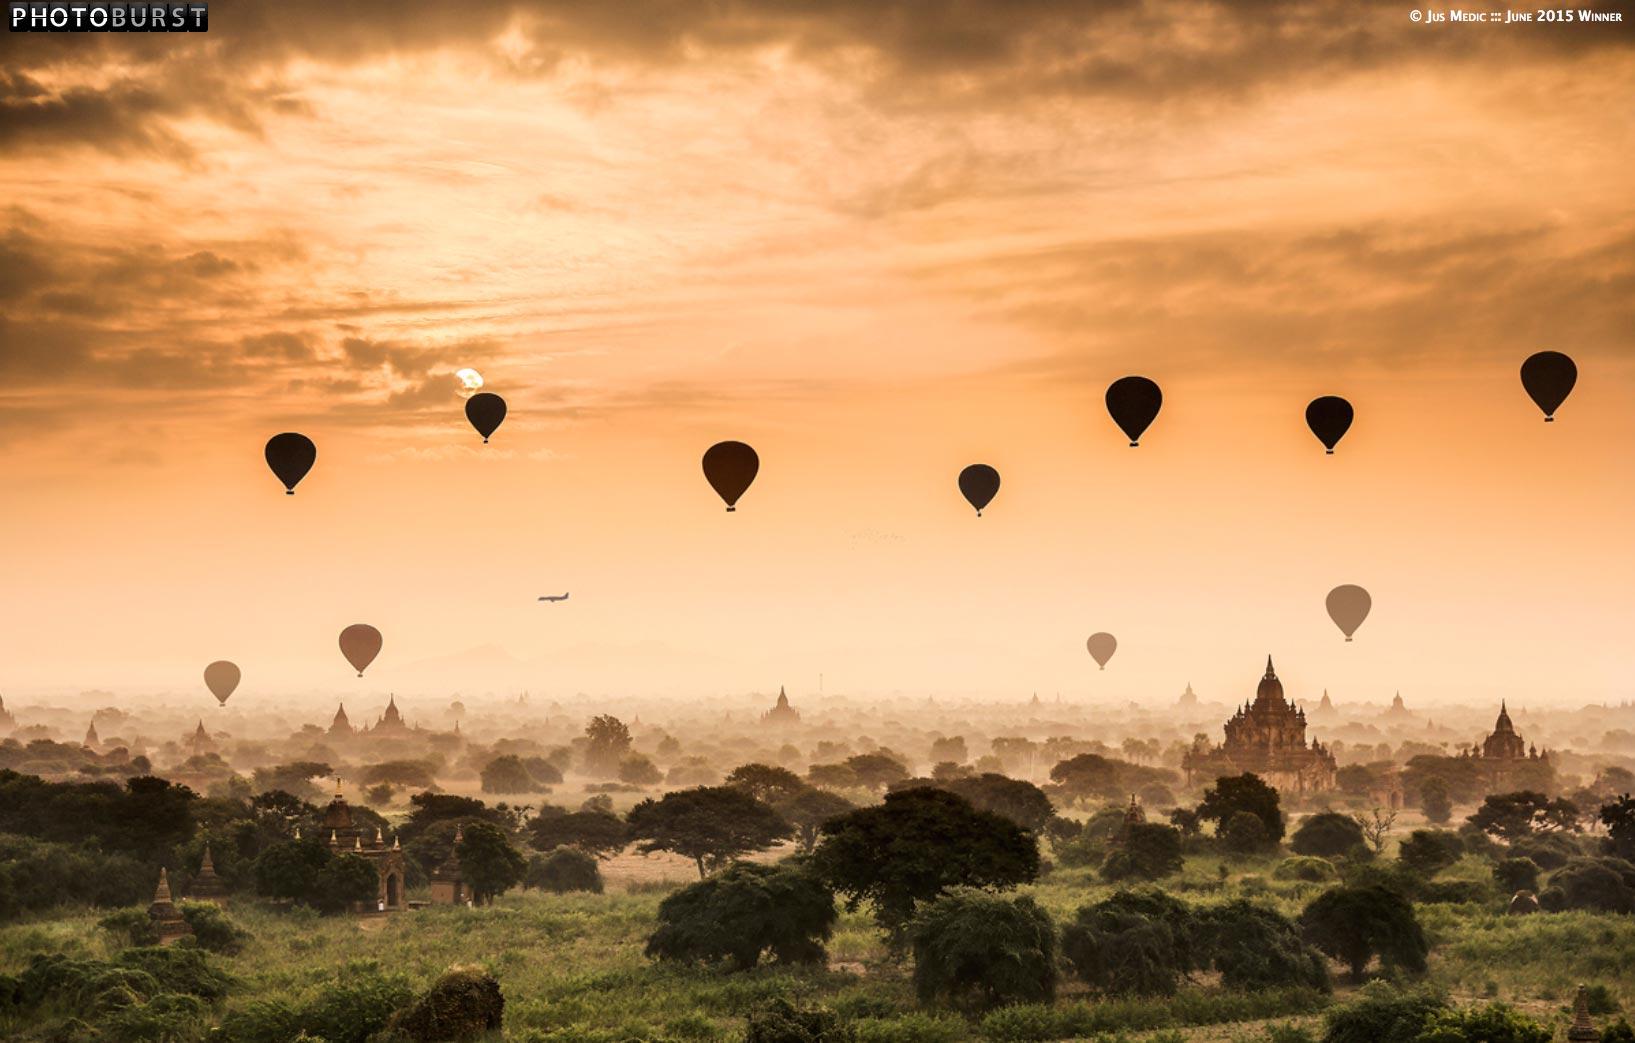 Myanmar---Bagan---JusMedic---POTM-Photoburst